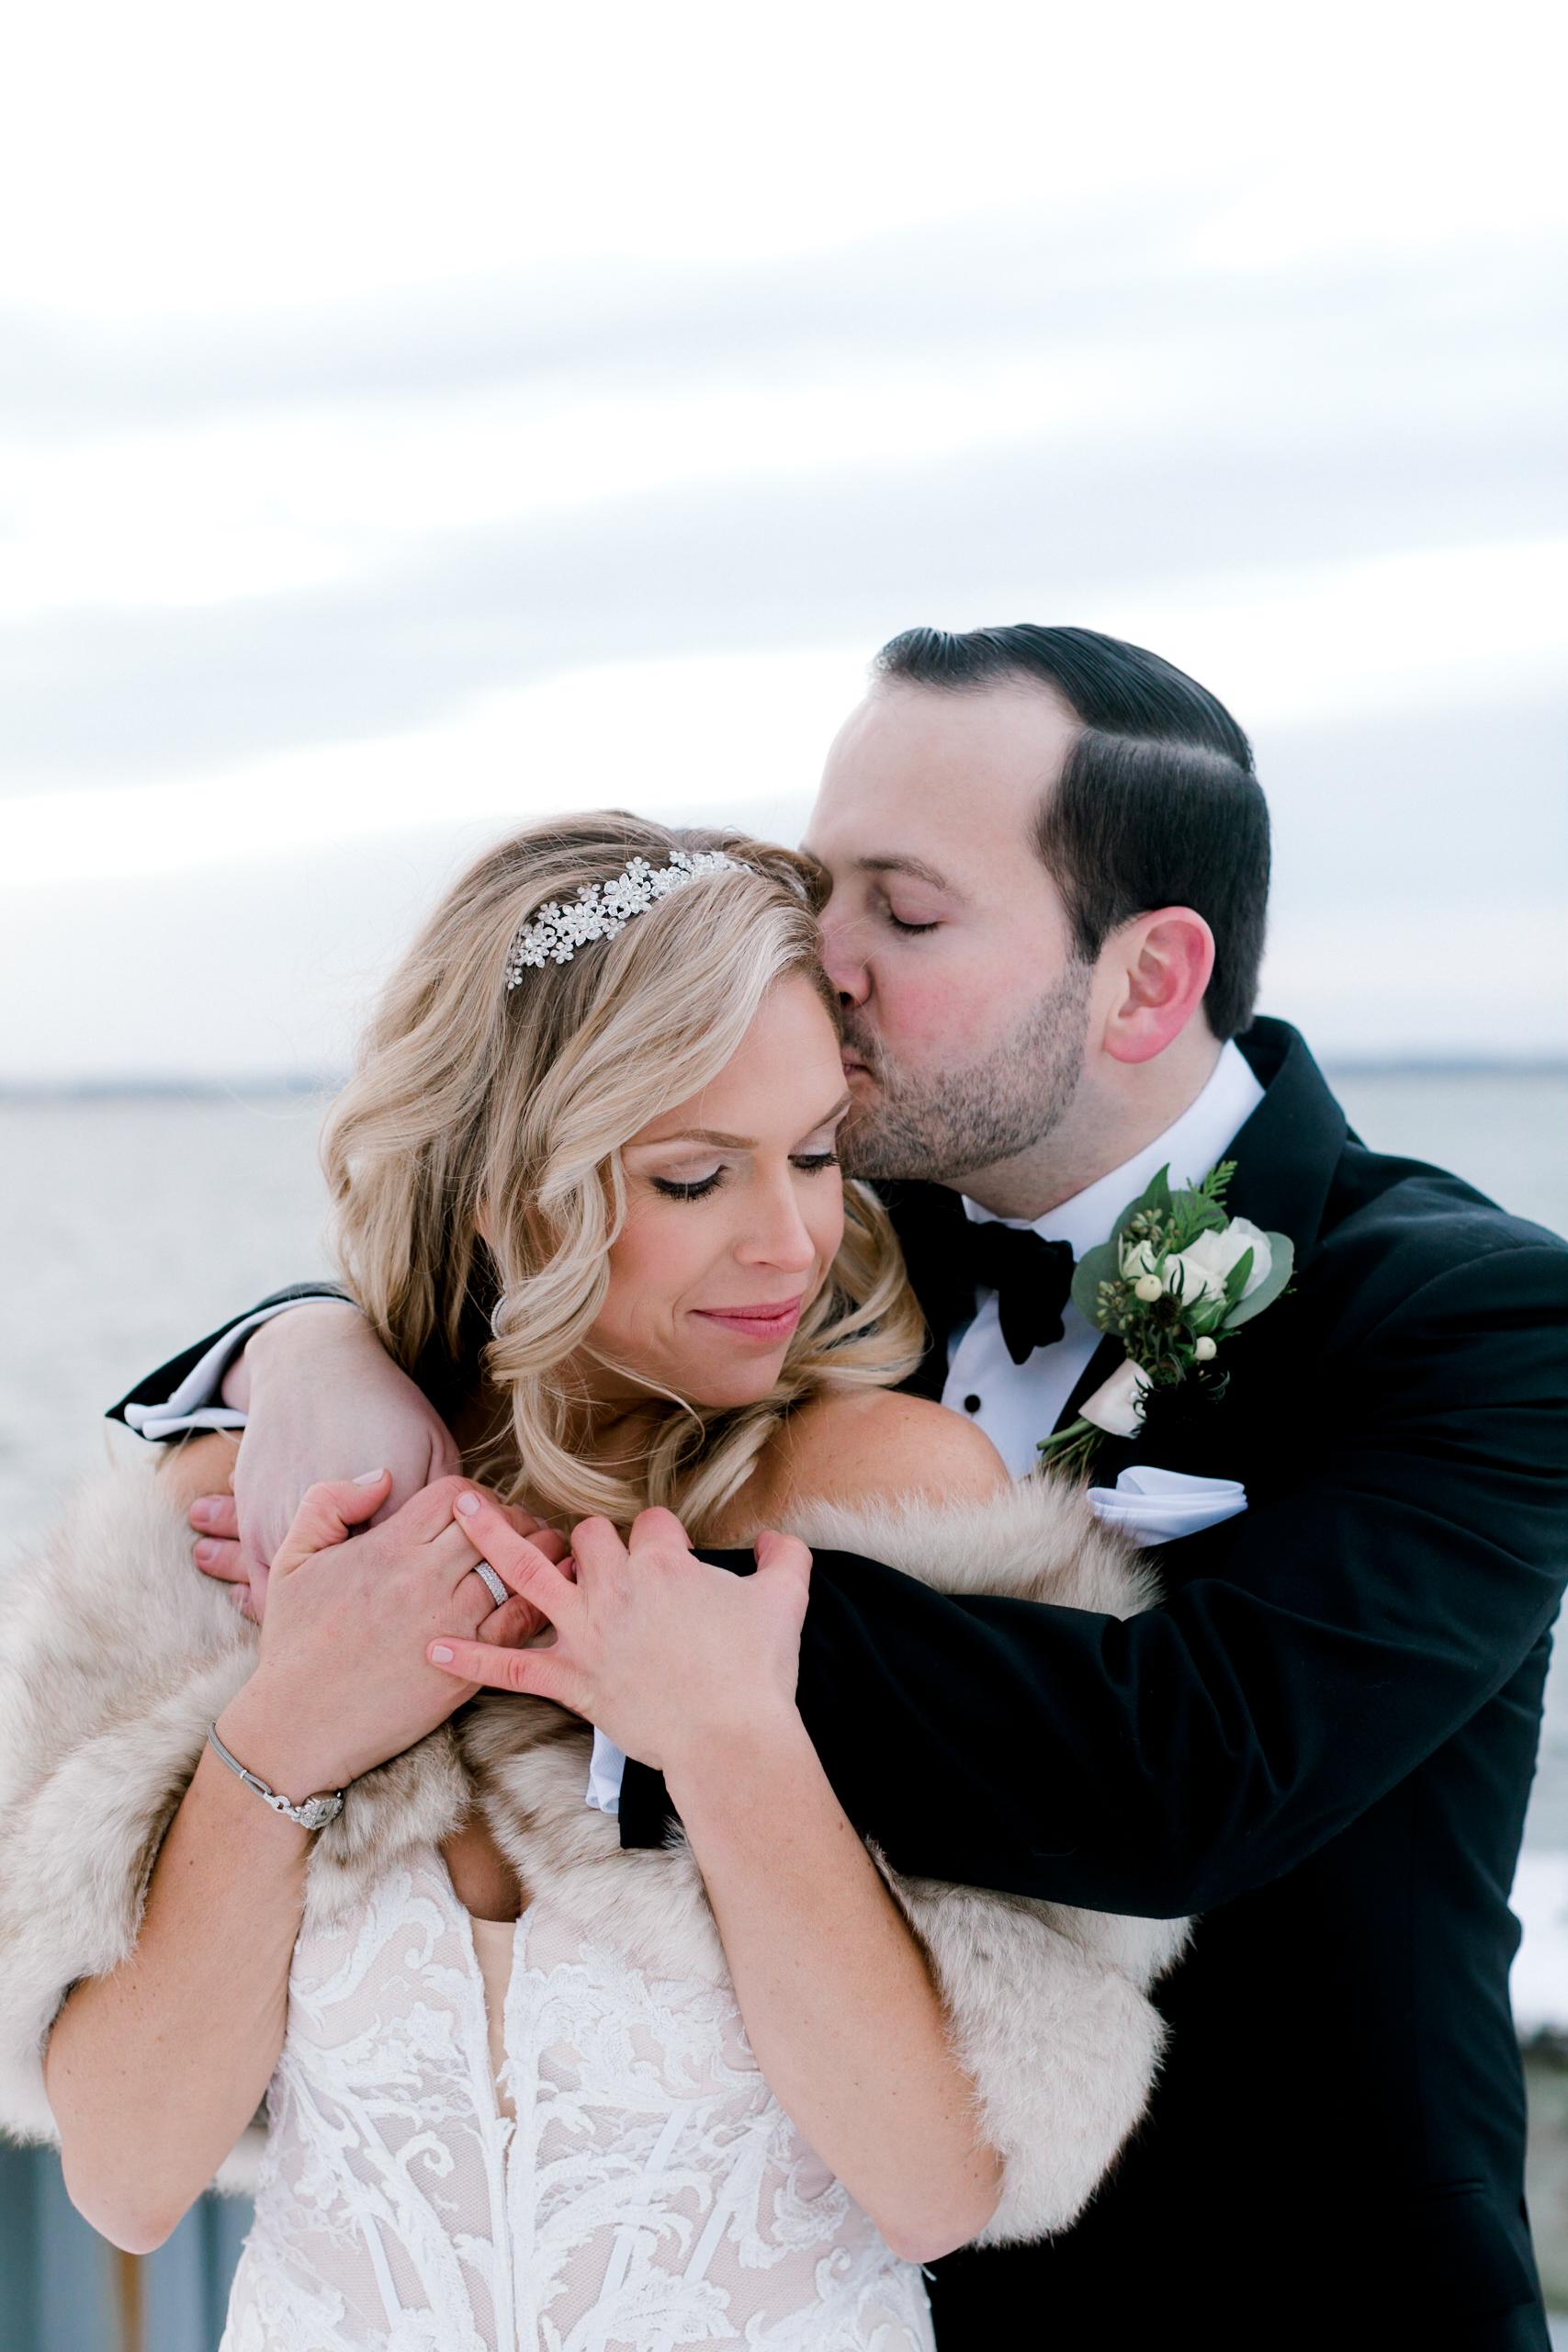 MagdalenaStudios_WeddingPhotographer_SeaIsleYachtClub-301.jpg